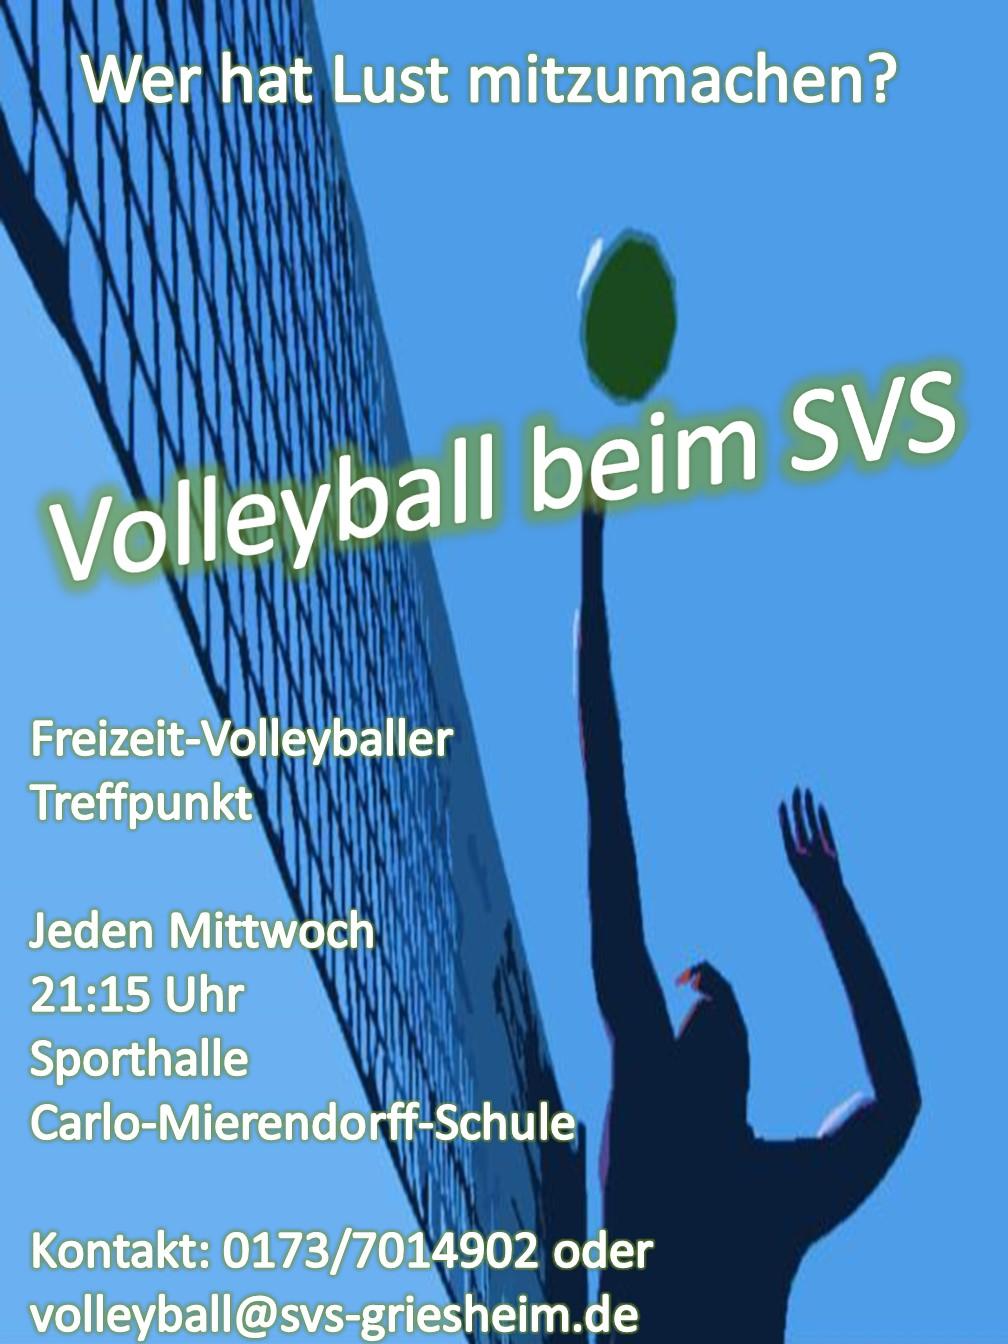 CUc4Th4d_SVS Plakat 2.jpg